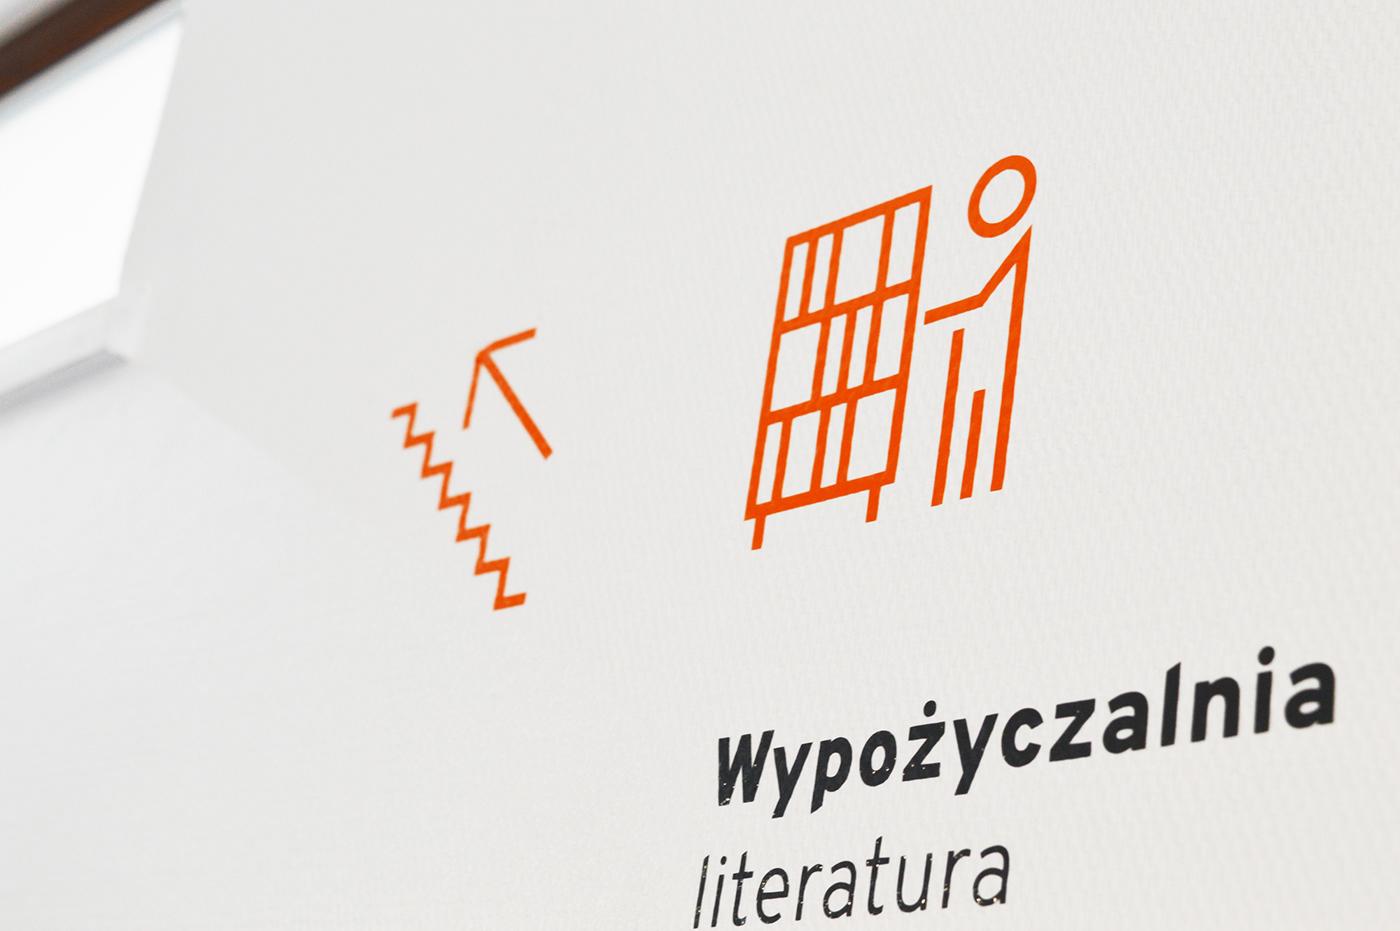 MEDIATEKA 文化站标识设计©muchaDSGN